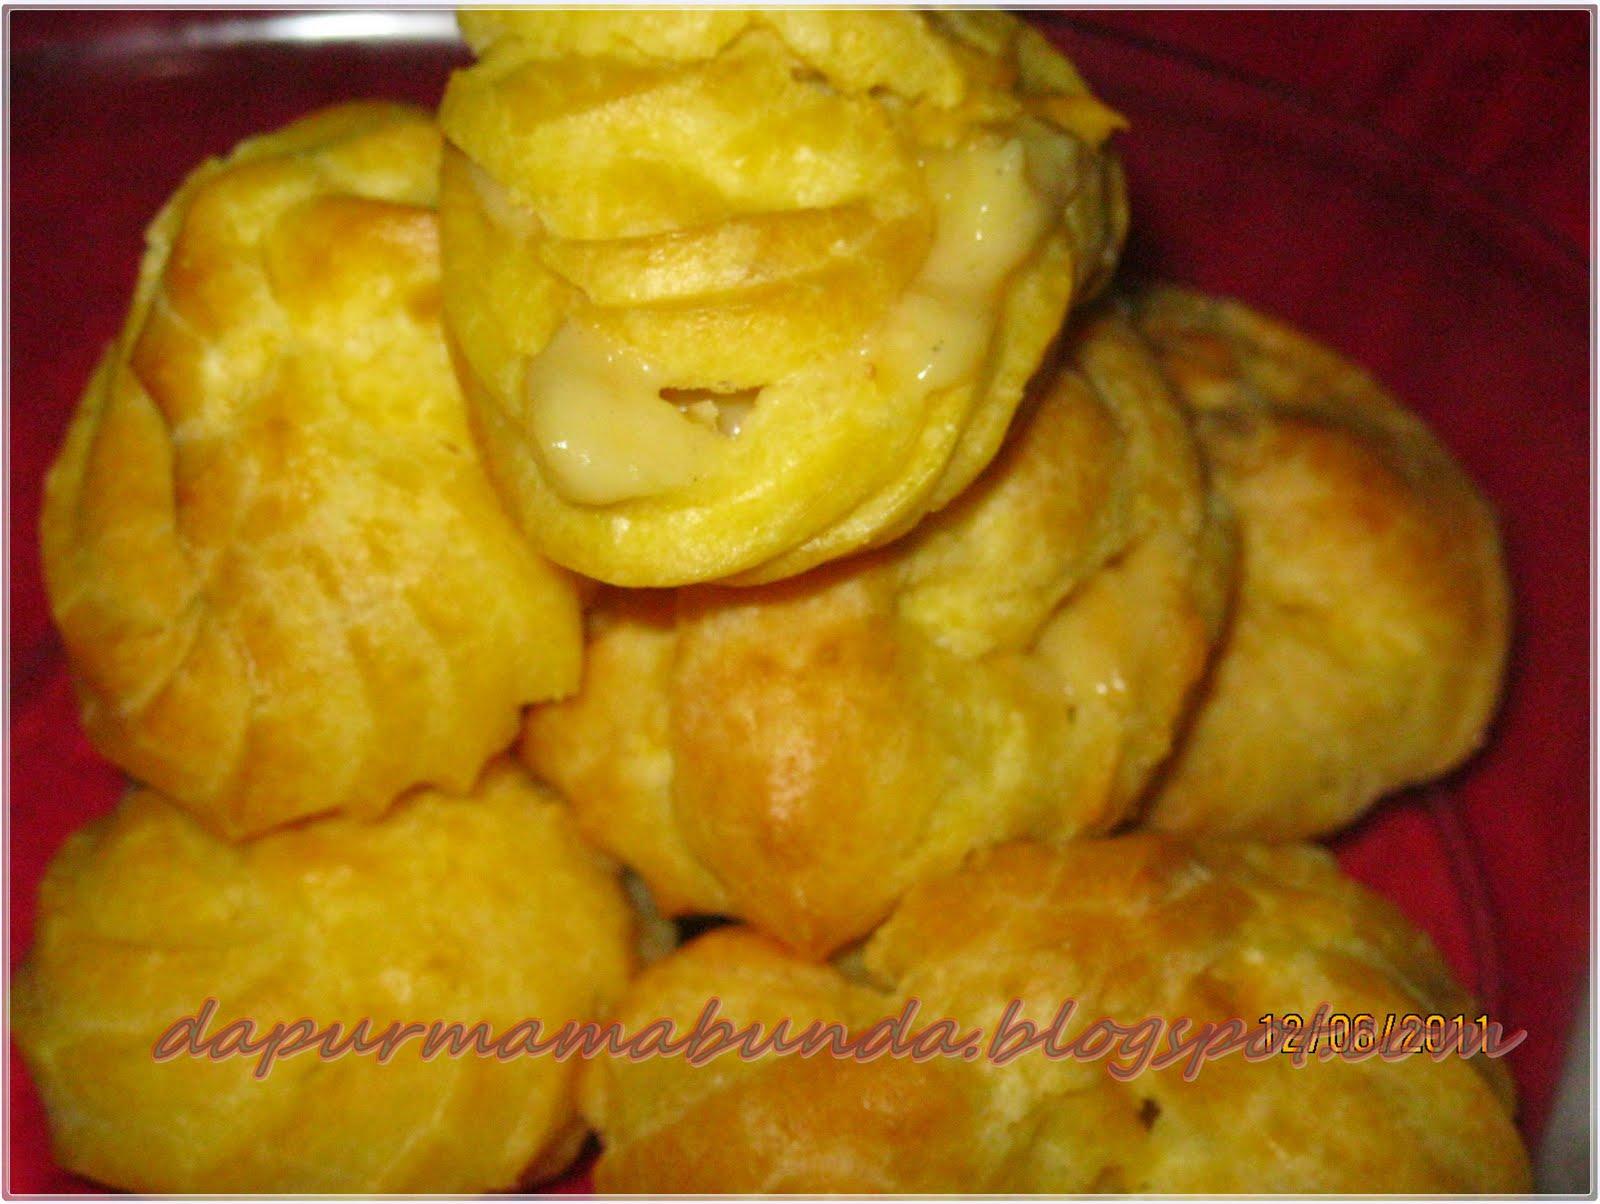 Kue Soes vla durian (Sumber: Milis DapurBunda )